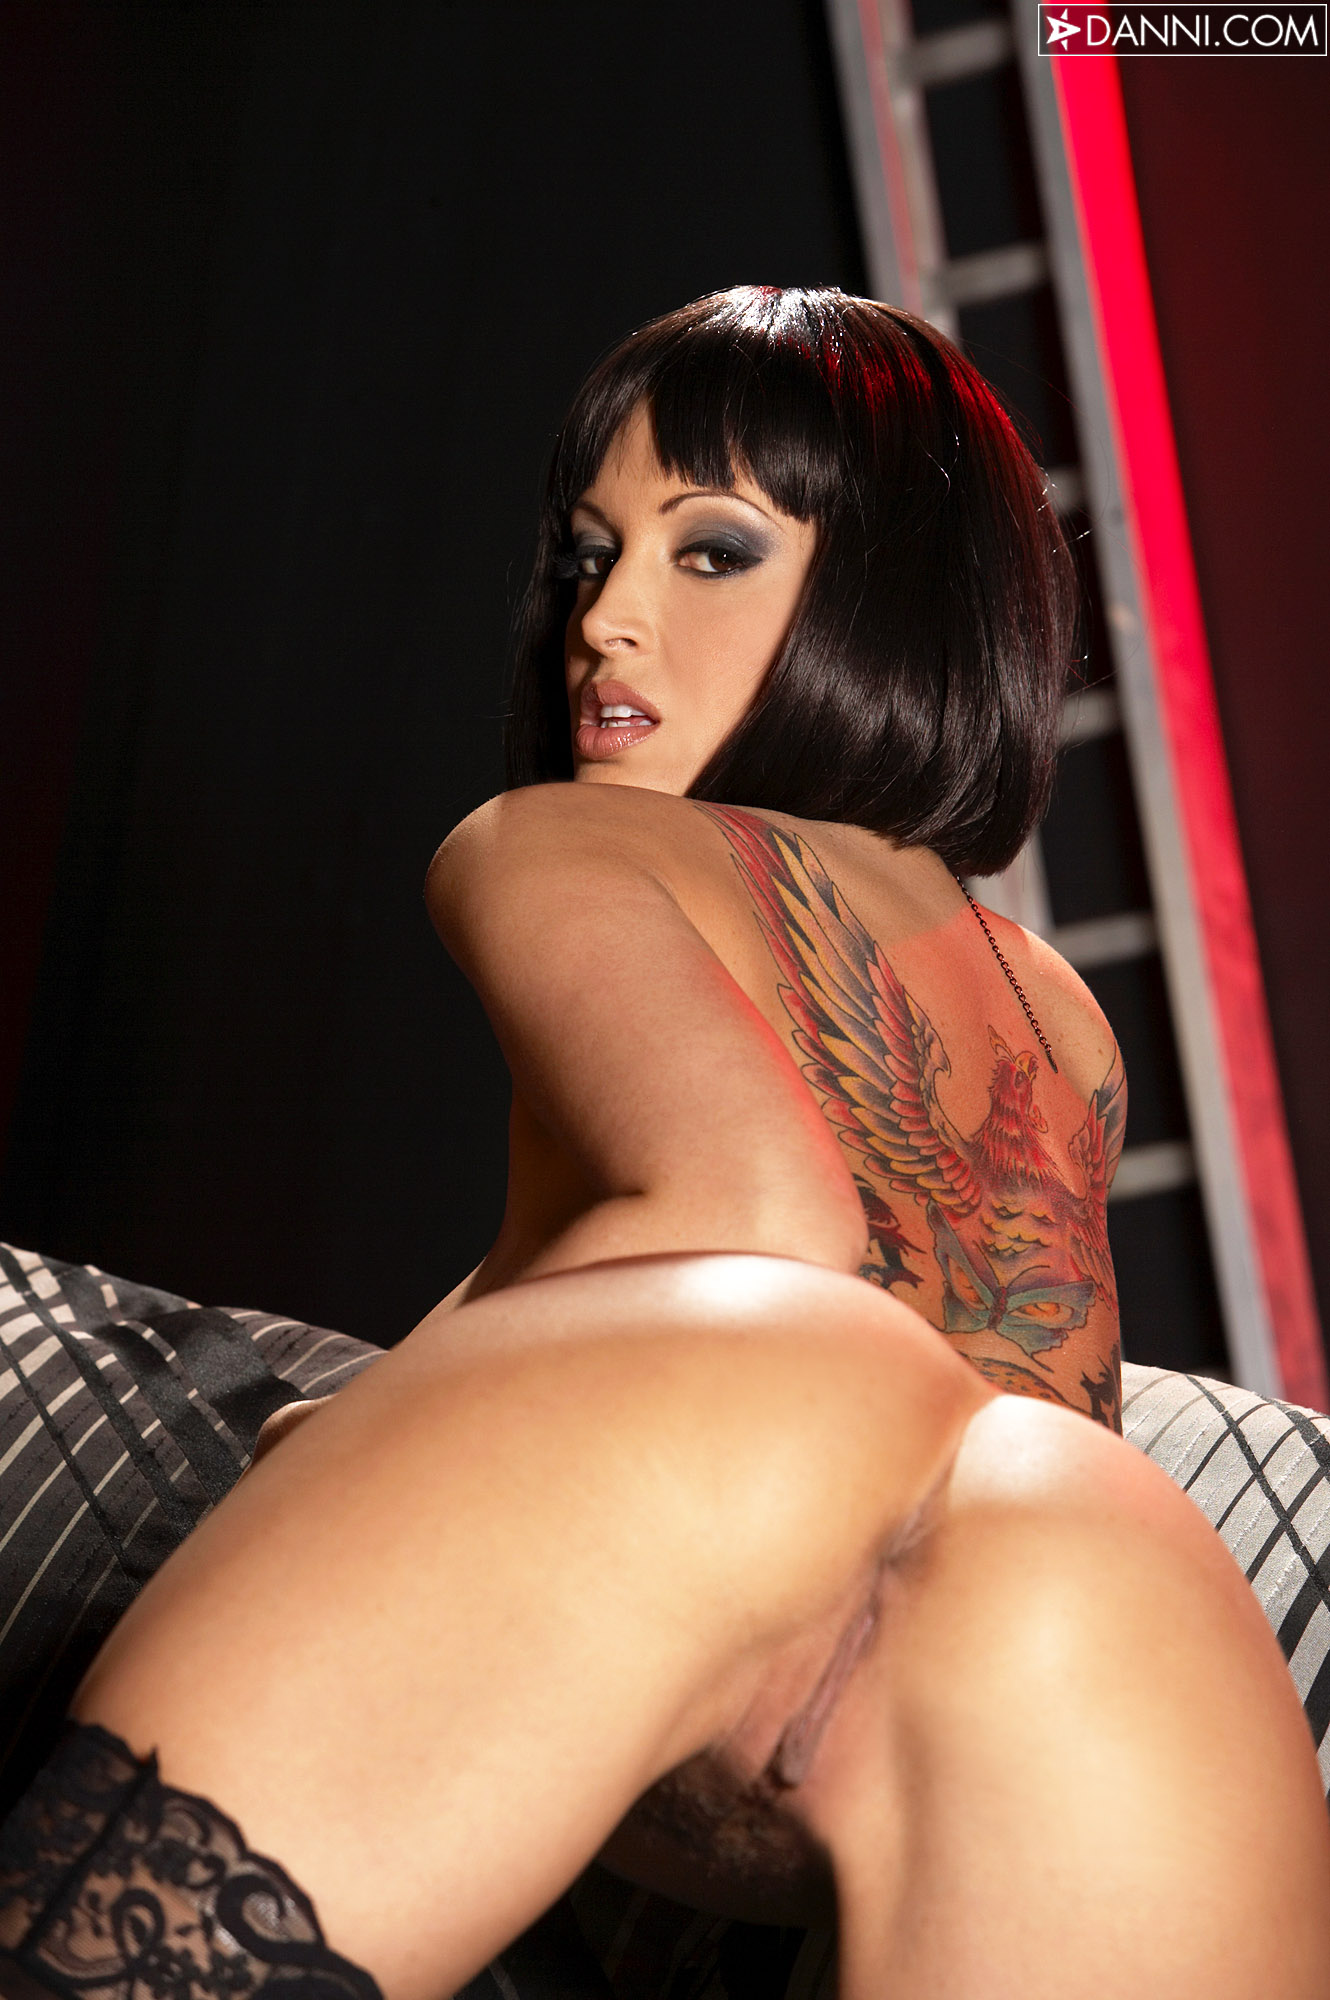 Nikki Nova Gallery > Sexy Beauties